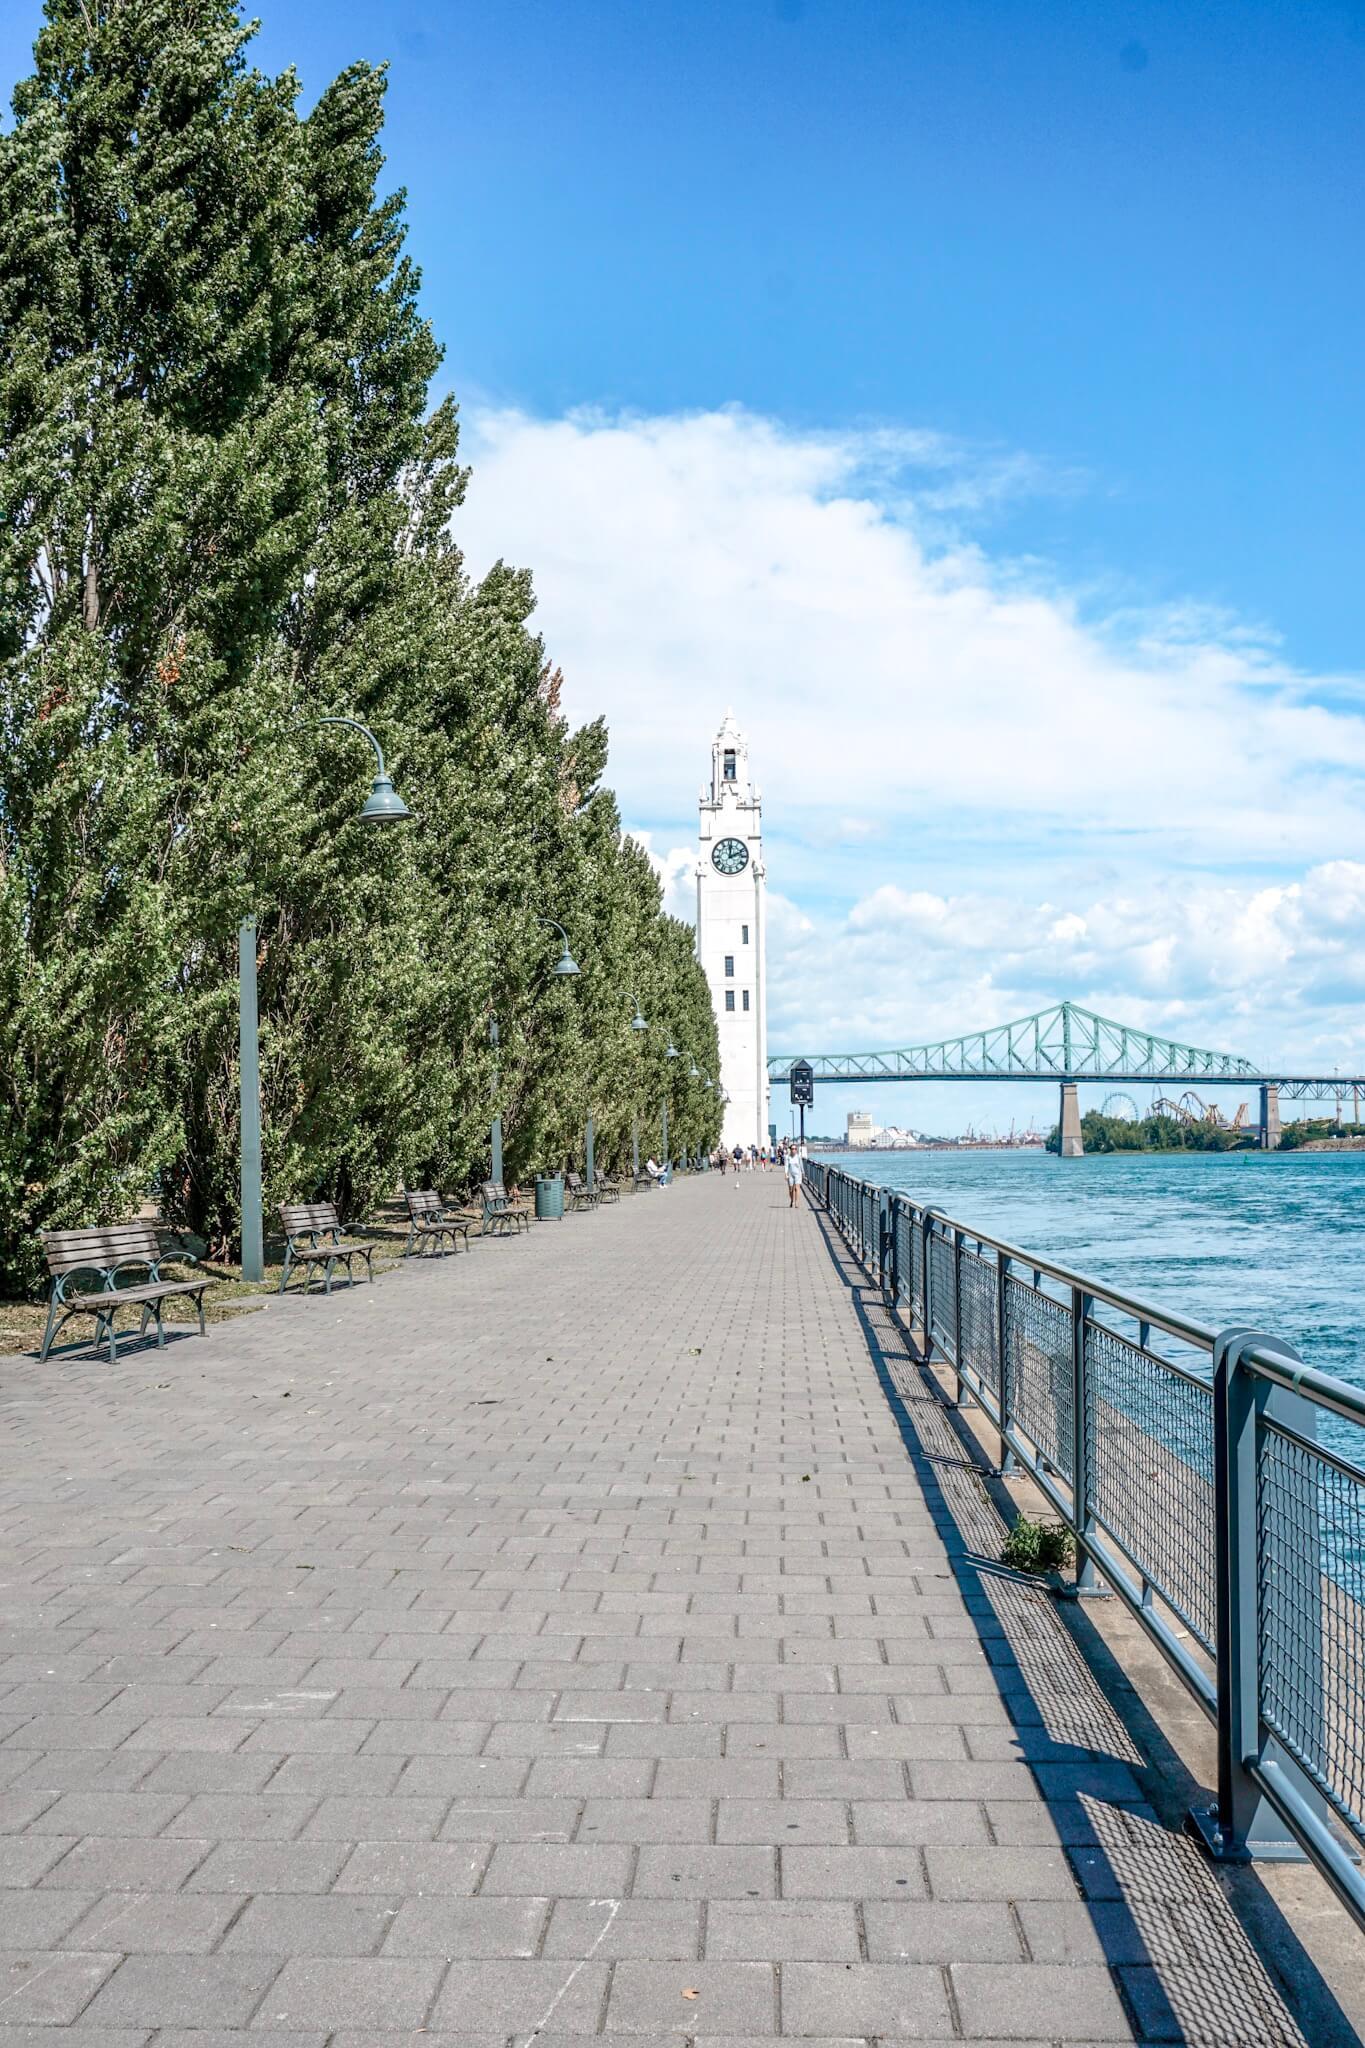 quartier du vieux port montreal quebec